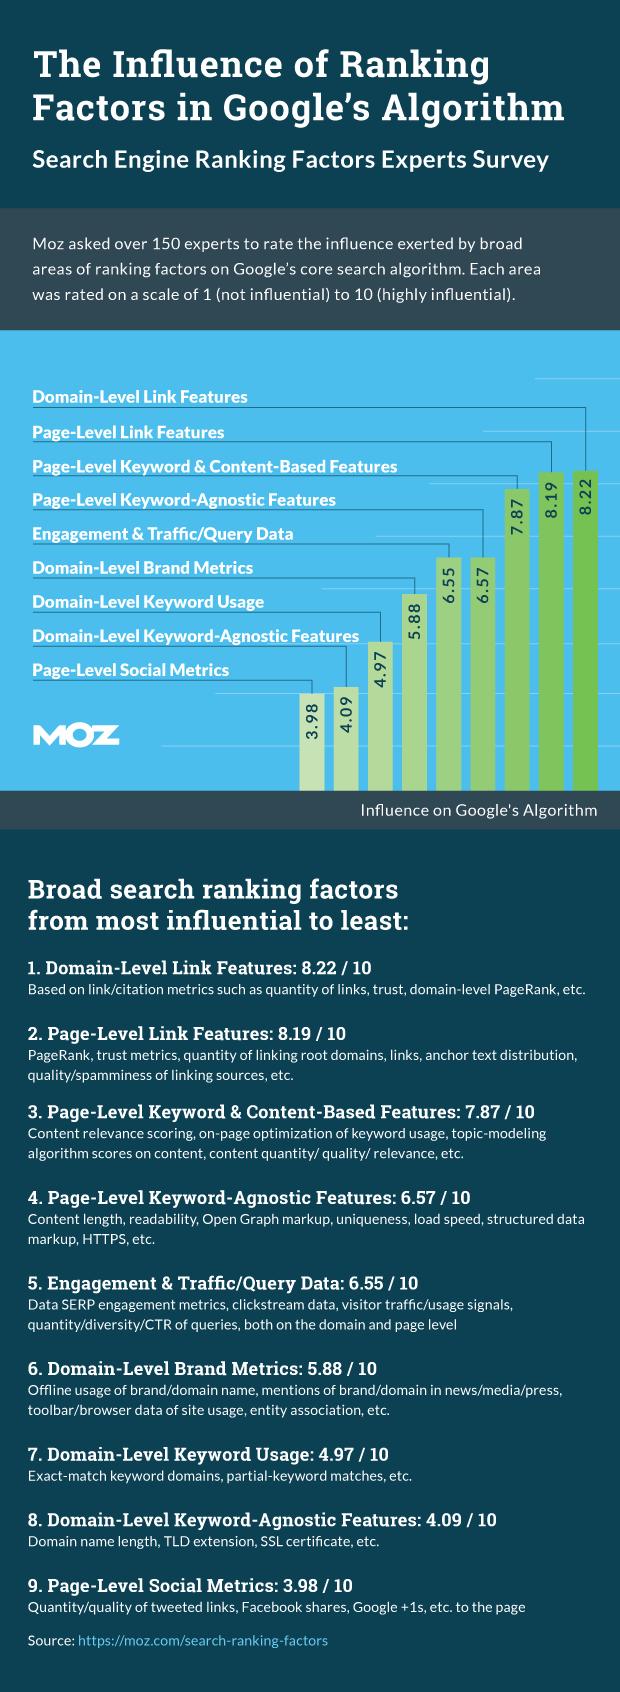 MOZ's Google Ranking Factors 2015